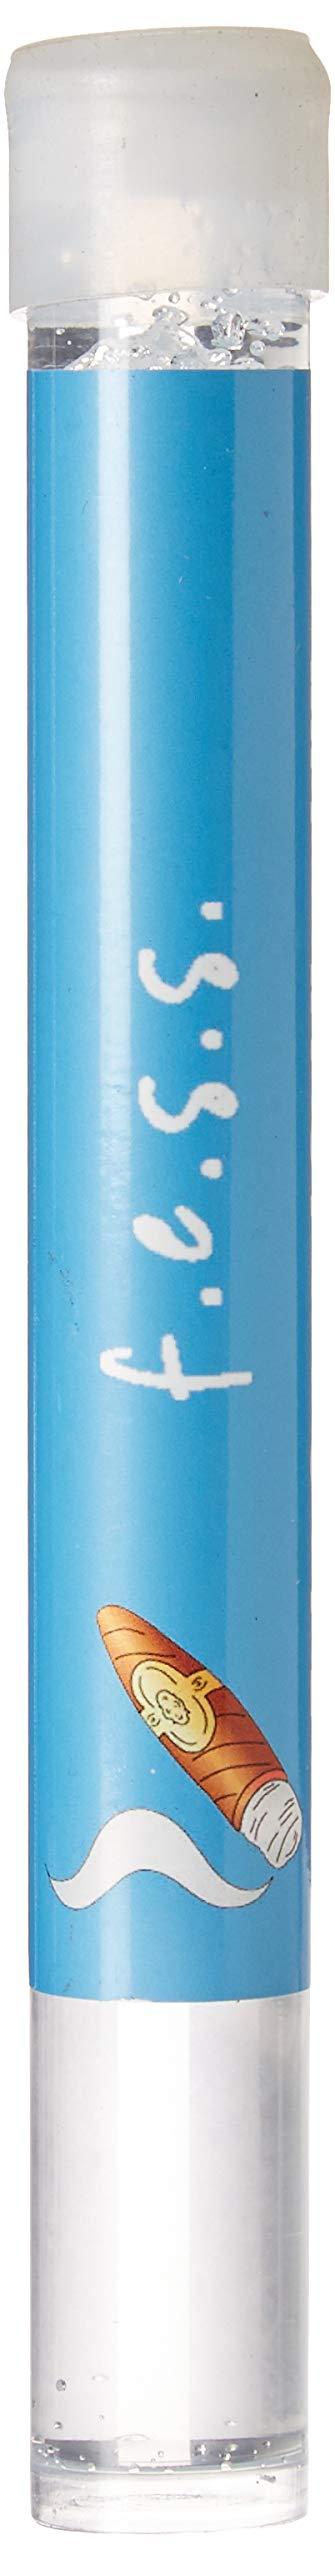 FESS Prodcuts Humidor Humidifier Crystal